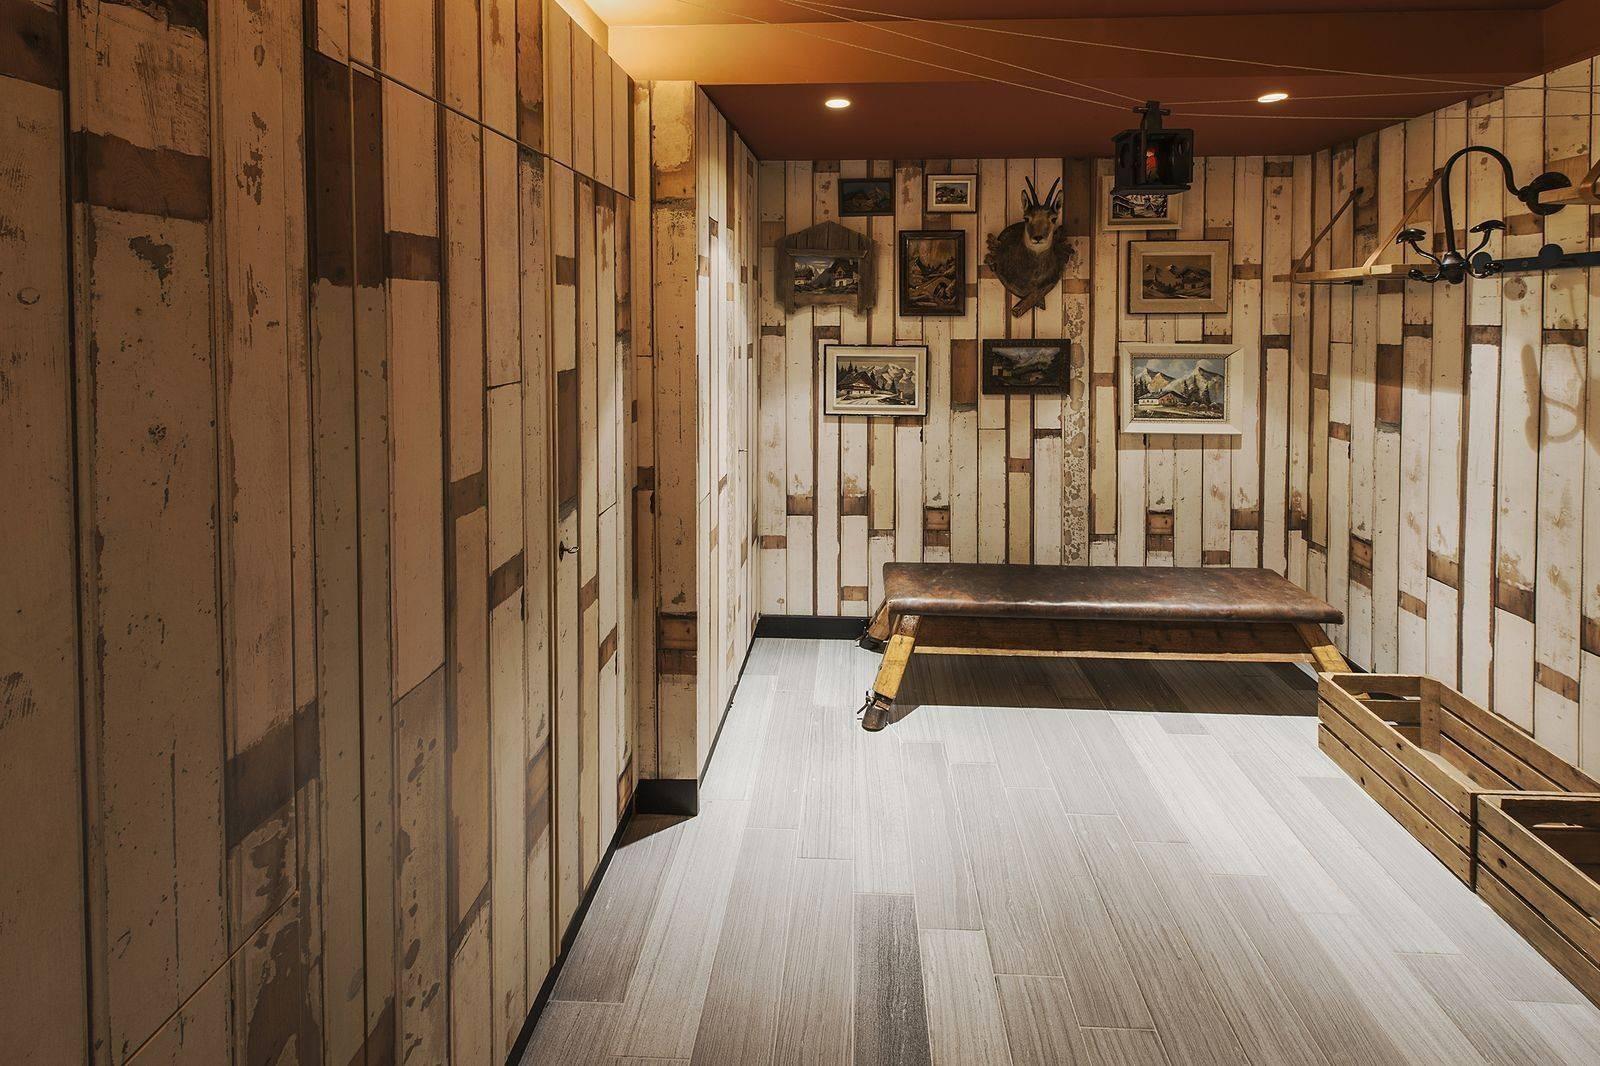 Courchevel 1550 Luxury Rental Chalet Niibite Ski Room